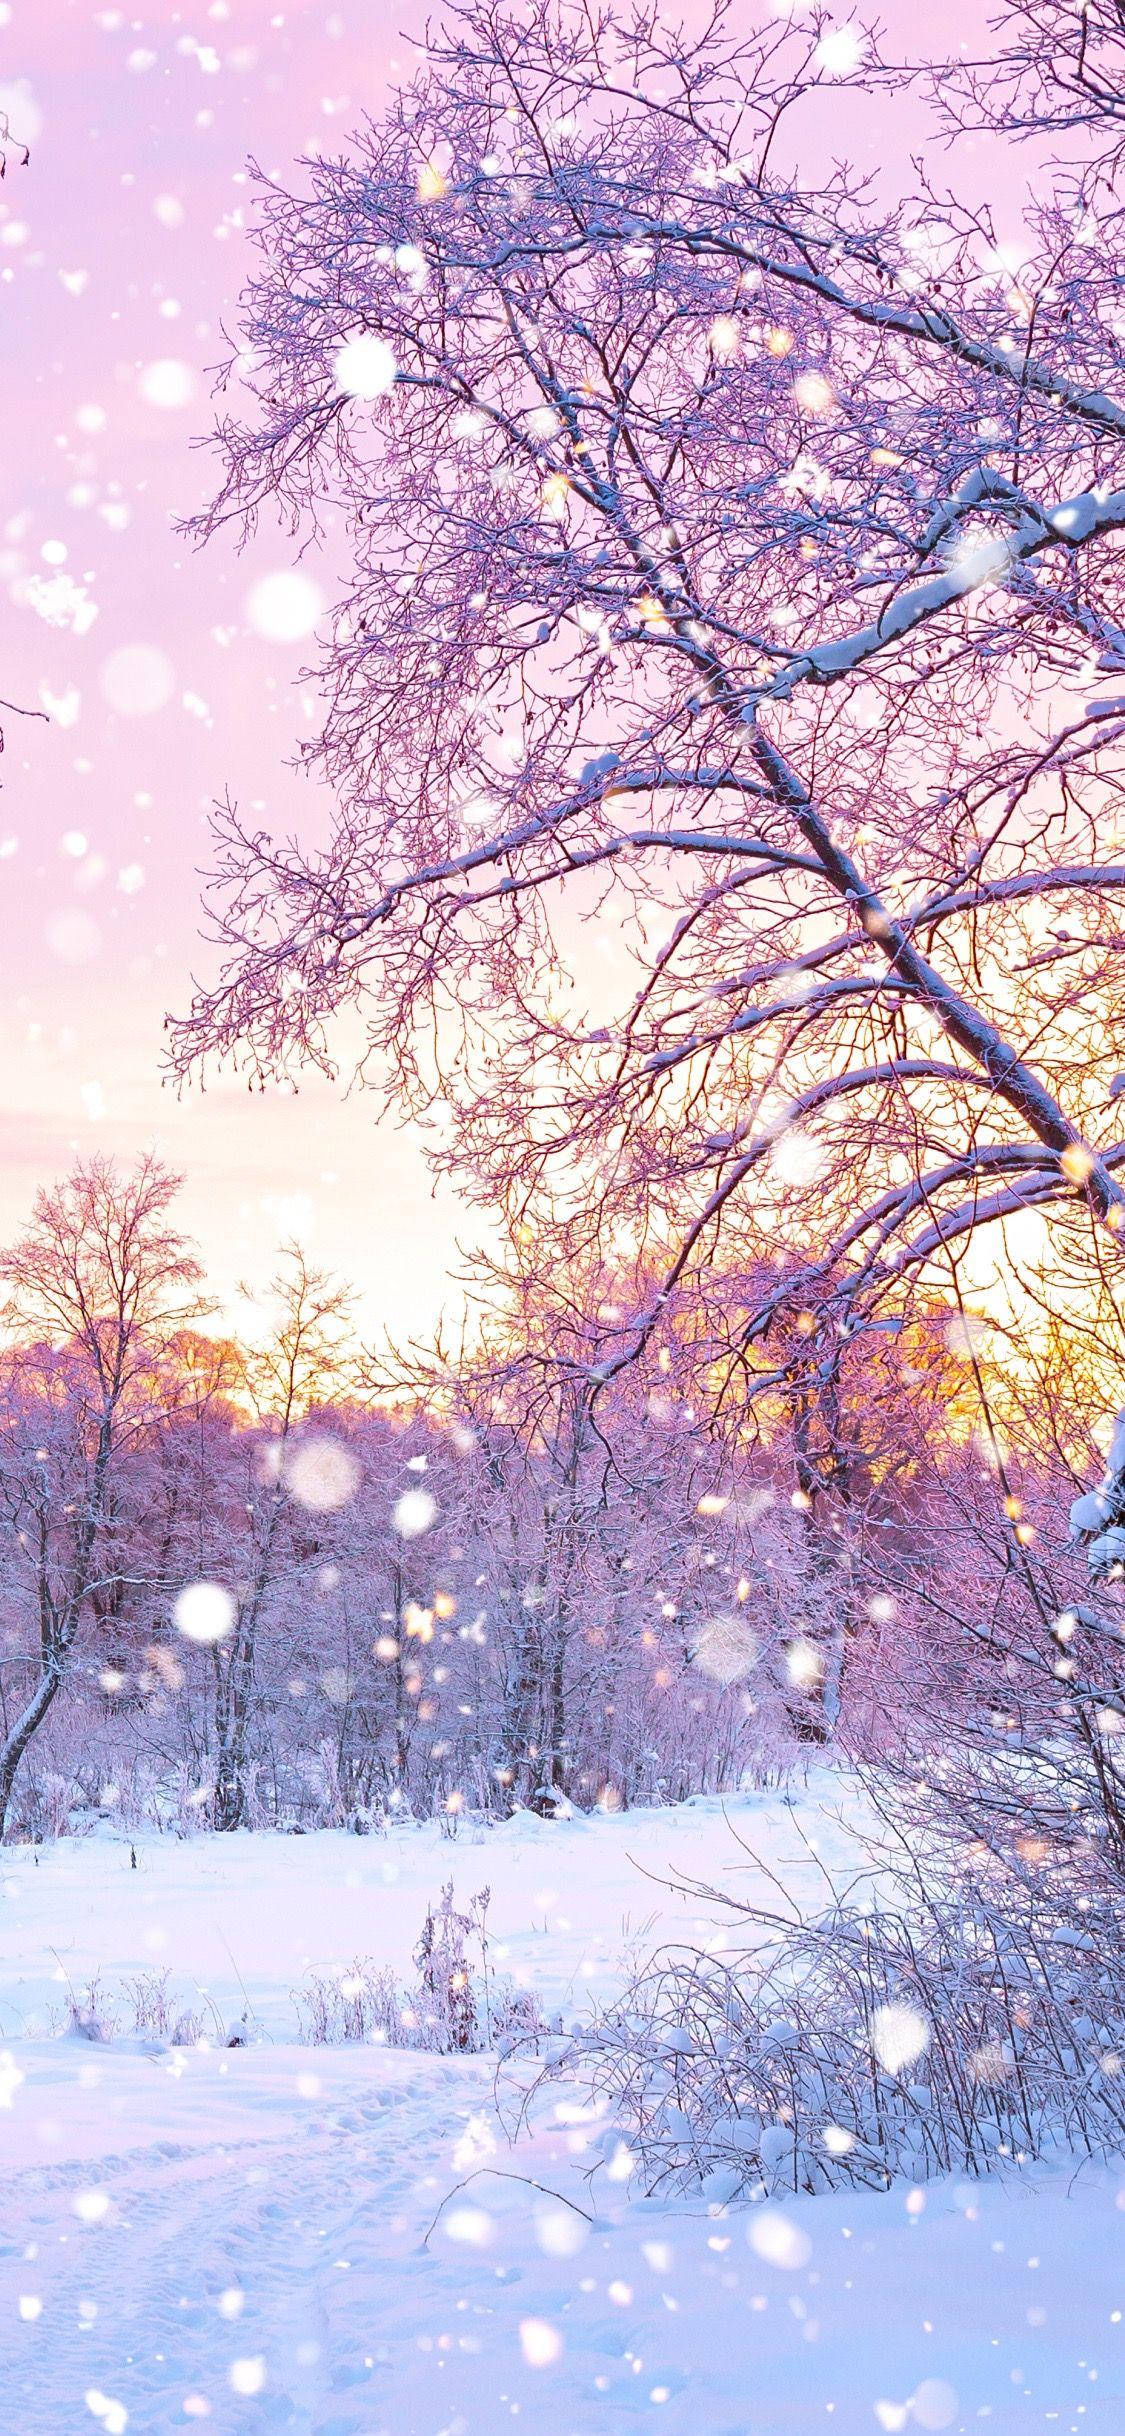 Snow Iphone Wallpaper Winter Wallpaper Beautiful Landscapes